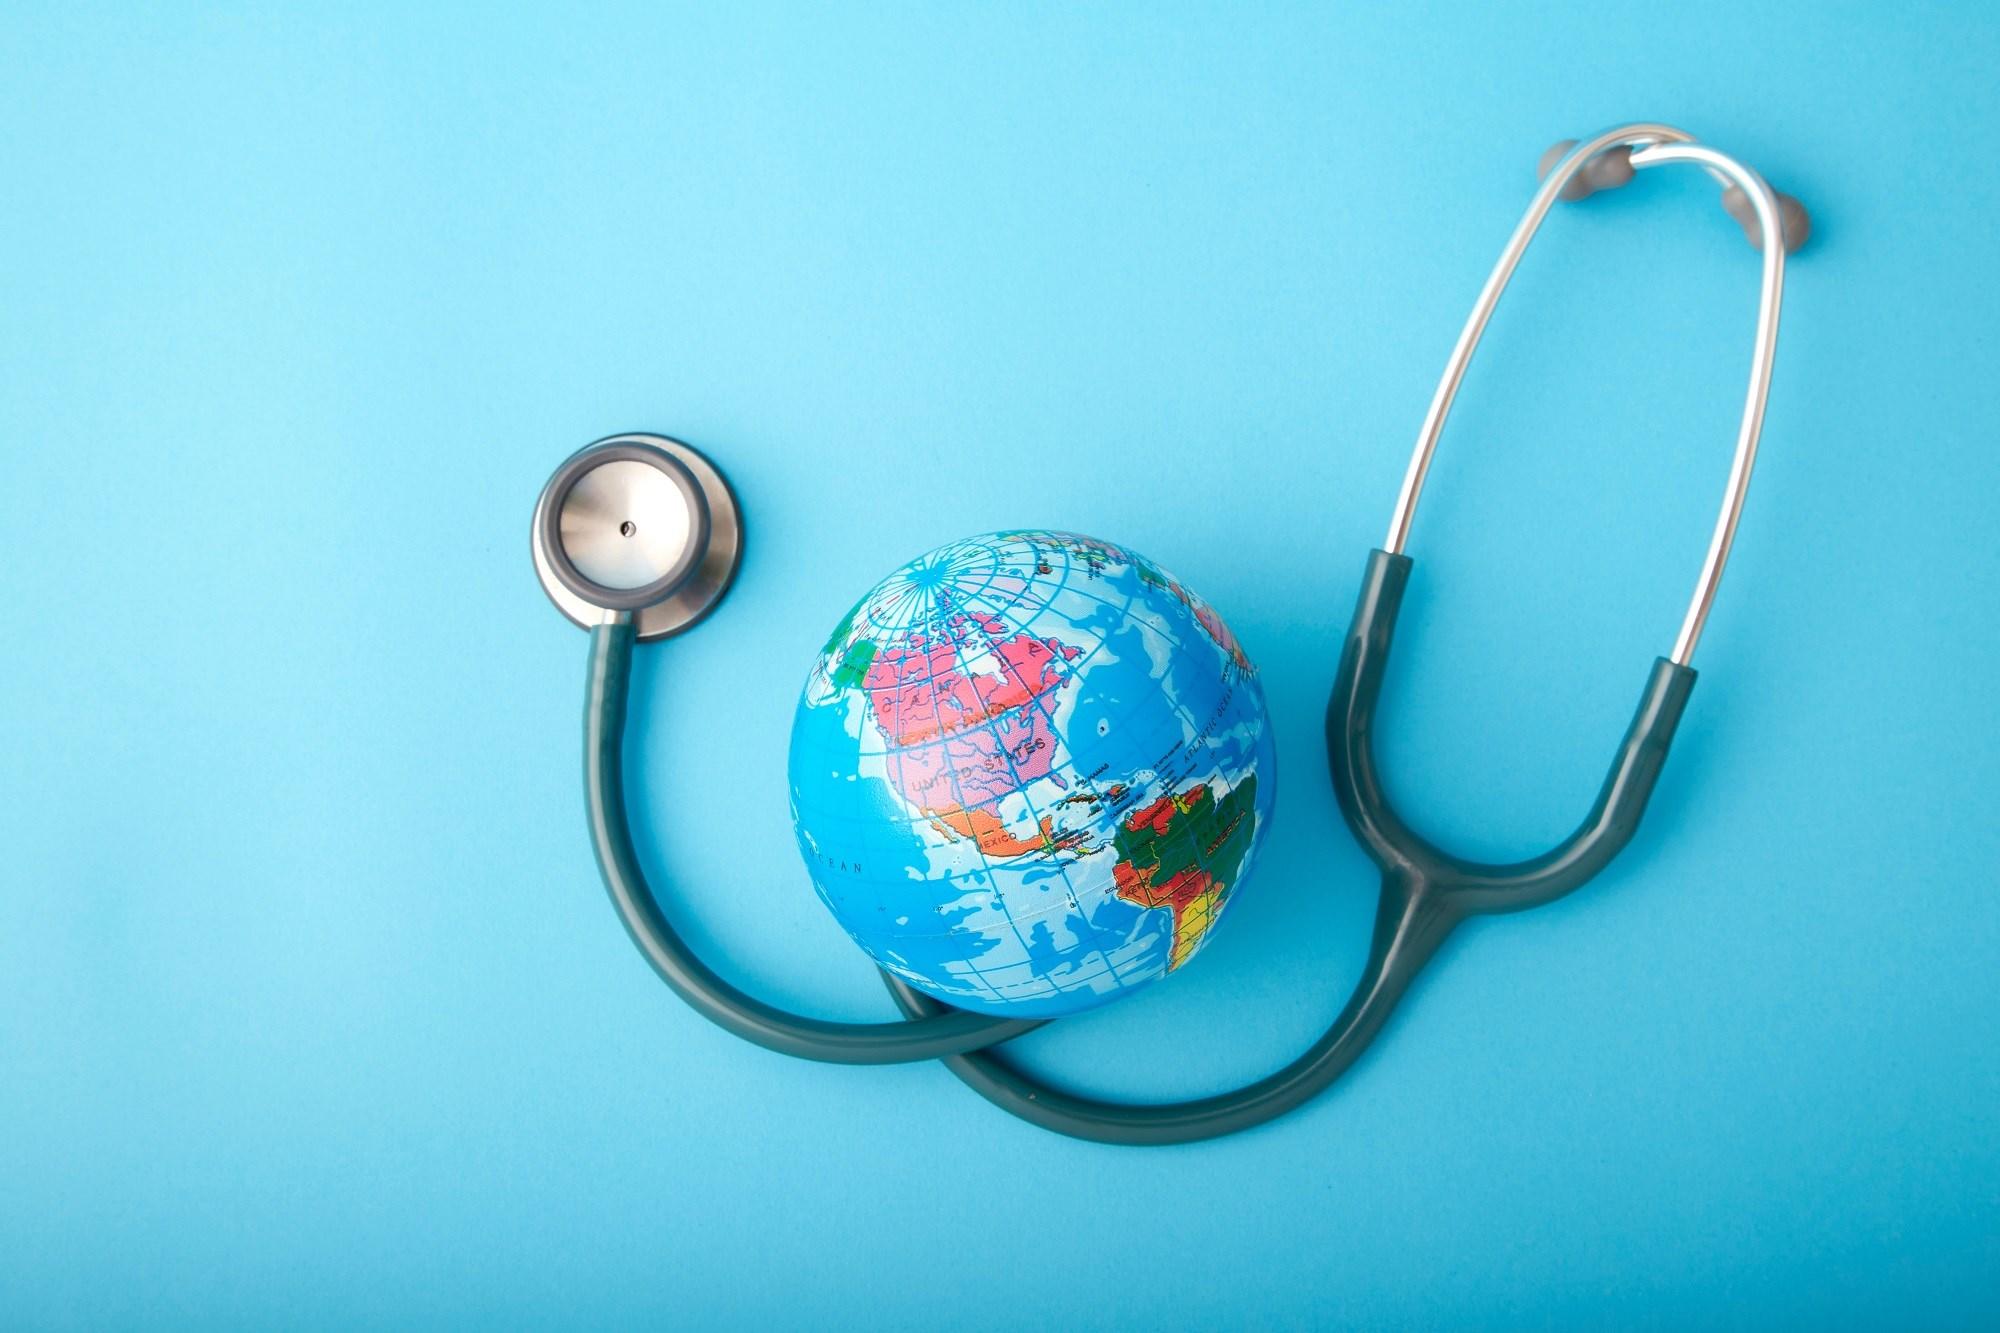 World Health Organization: Five-Year Plan to Address 10 Biggest Global Health Threats